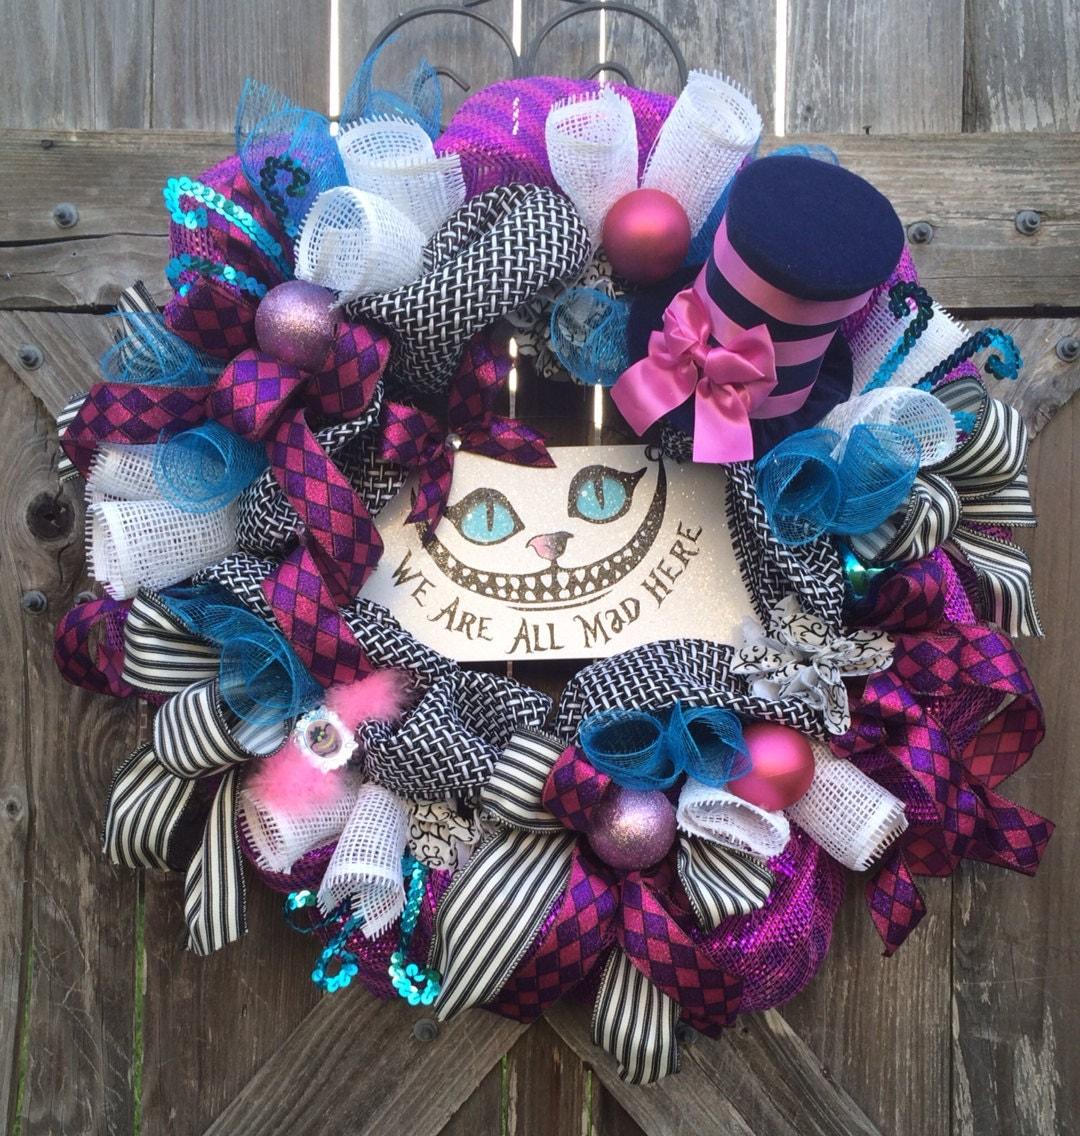 Alice in wonderland decor alice in wonderland wreath disney - Alice in wonderland decorations ...